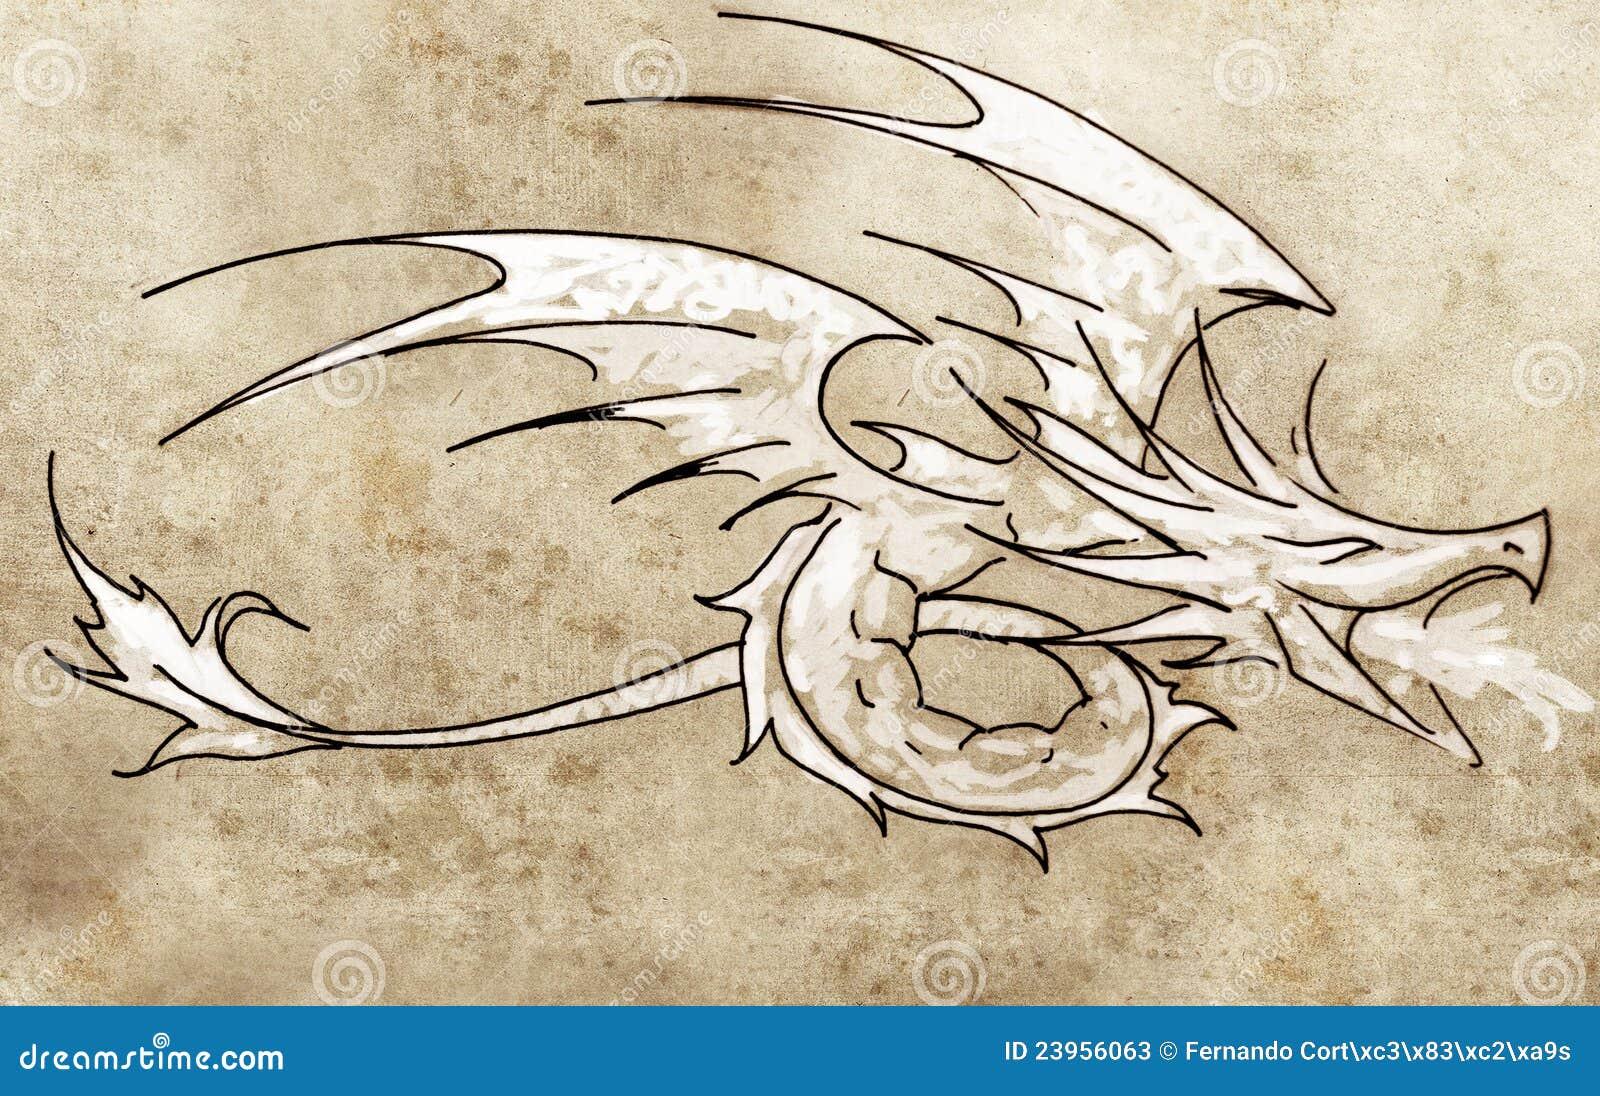 sketch of tattoo art dragon line drawing stock photos